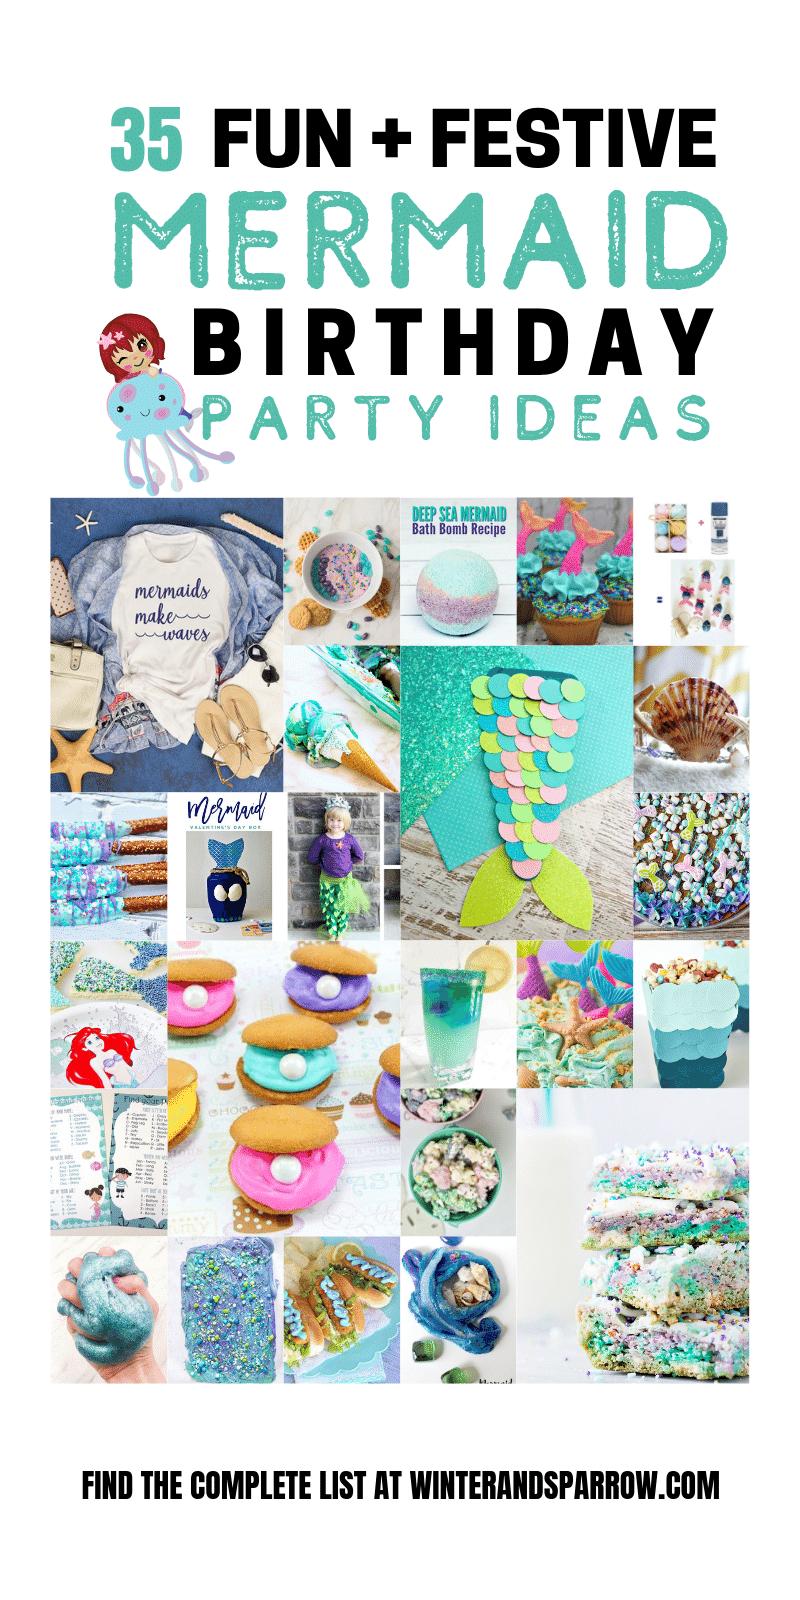 35 Fun + Festive Mermaid Birthday Party Ideas | winterandsparrow.com #mermaidbirthdayparty #mermaidbirthdaypartyideas #mermaidrecipes #mermaidcrafts #mermaidprintables #mermaidbirthday